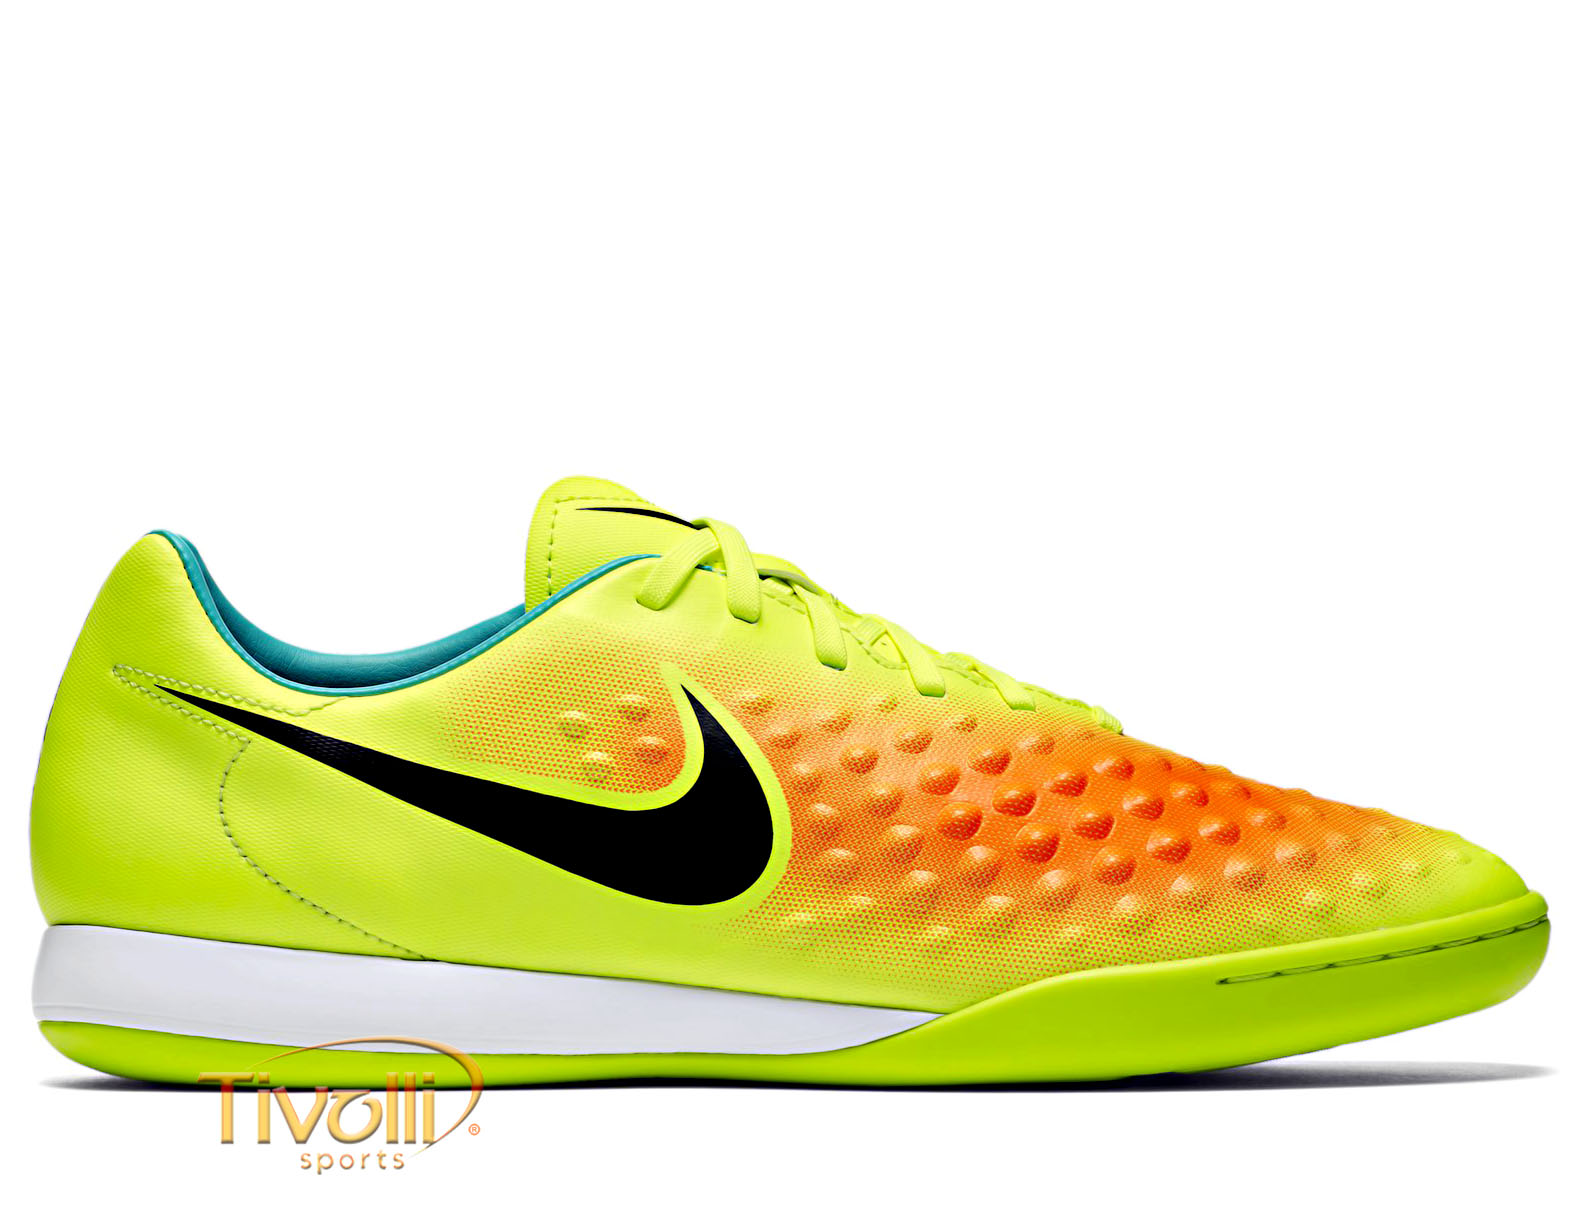 2b30ec467042e Chuteira Nike Magistax Opus II IC Infantil Futsal Verde Flúor e Laranja